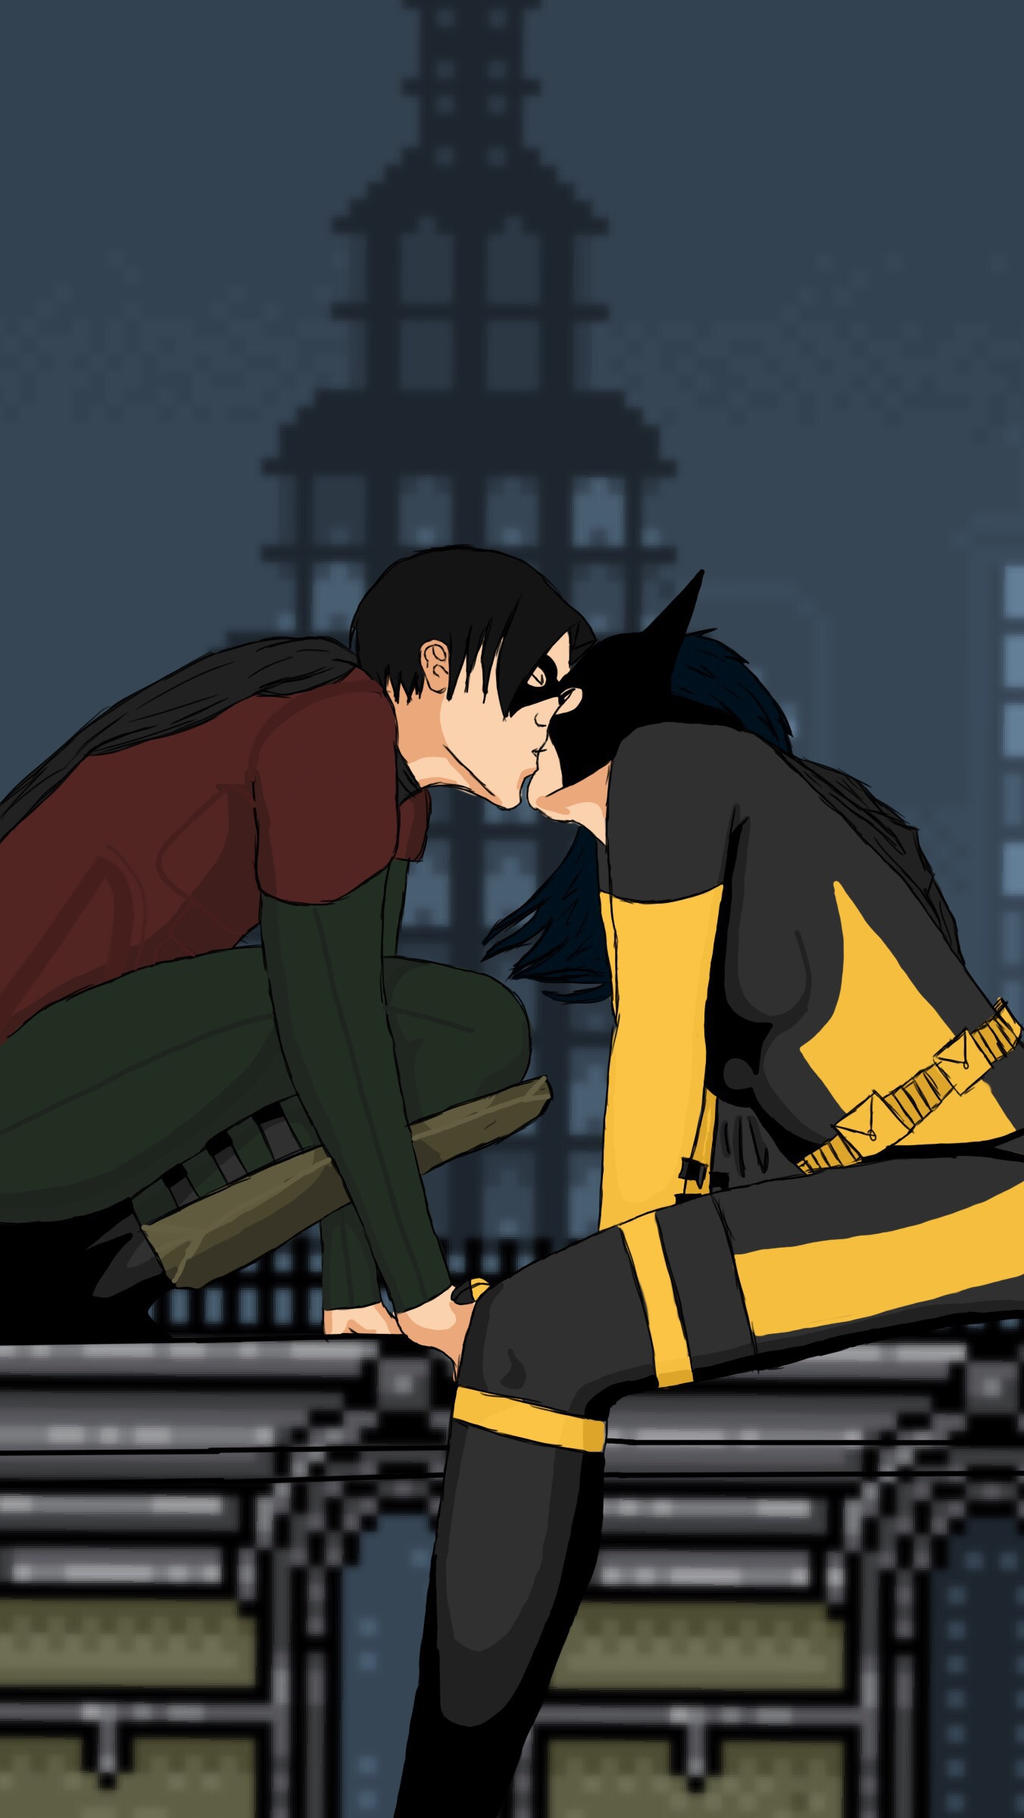 batgirl and robin start dating Add date: september 12, 2013,  oracle, barbara gordon, huntress, babs, barb, batgirl/robin, remembers, hallelujah, sad, tragic, dc  - start with 20 lucky.